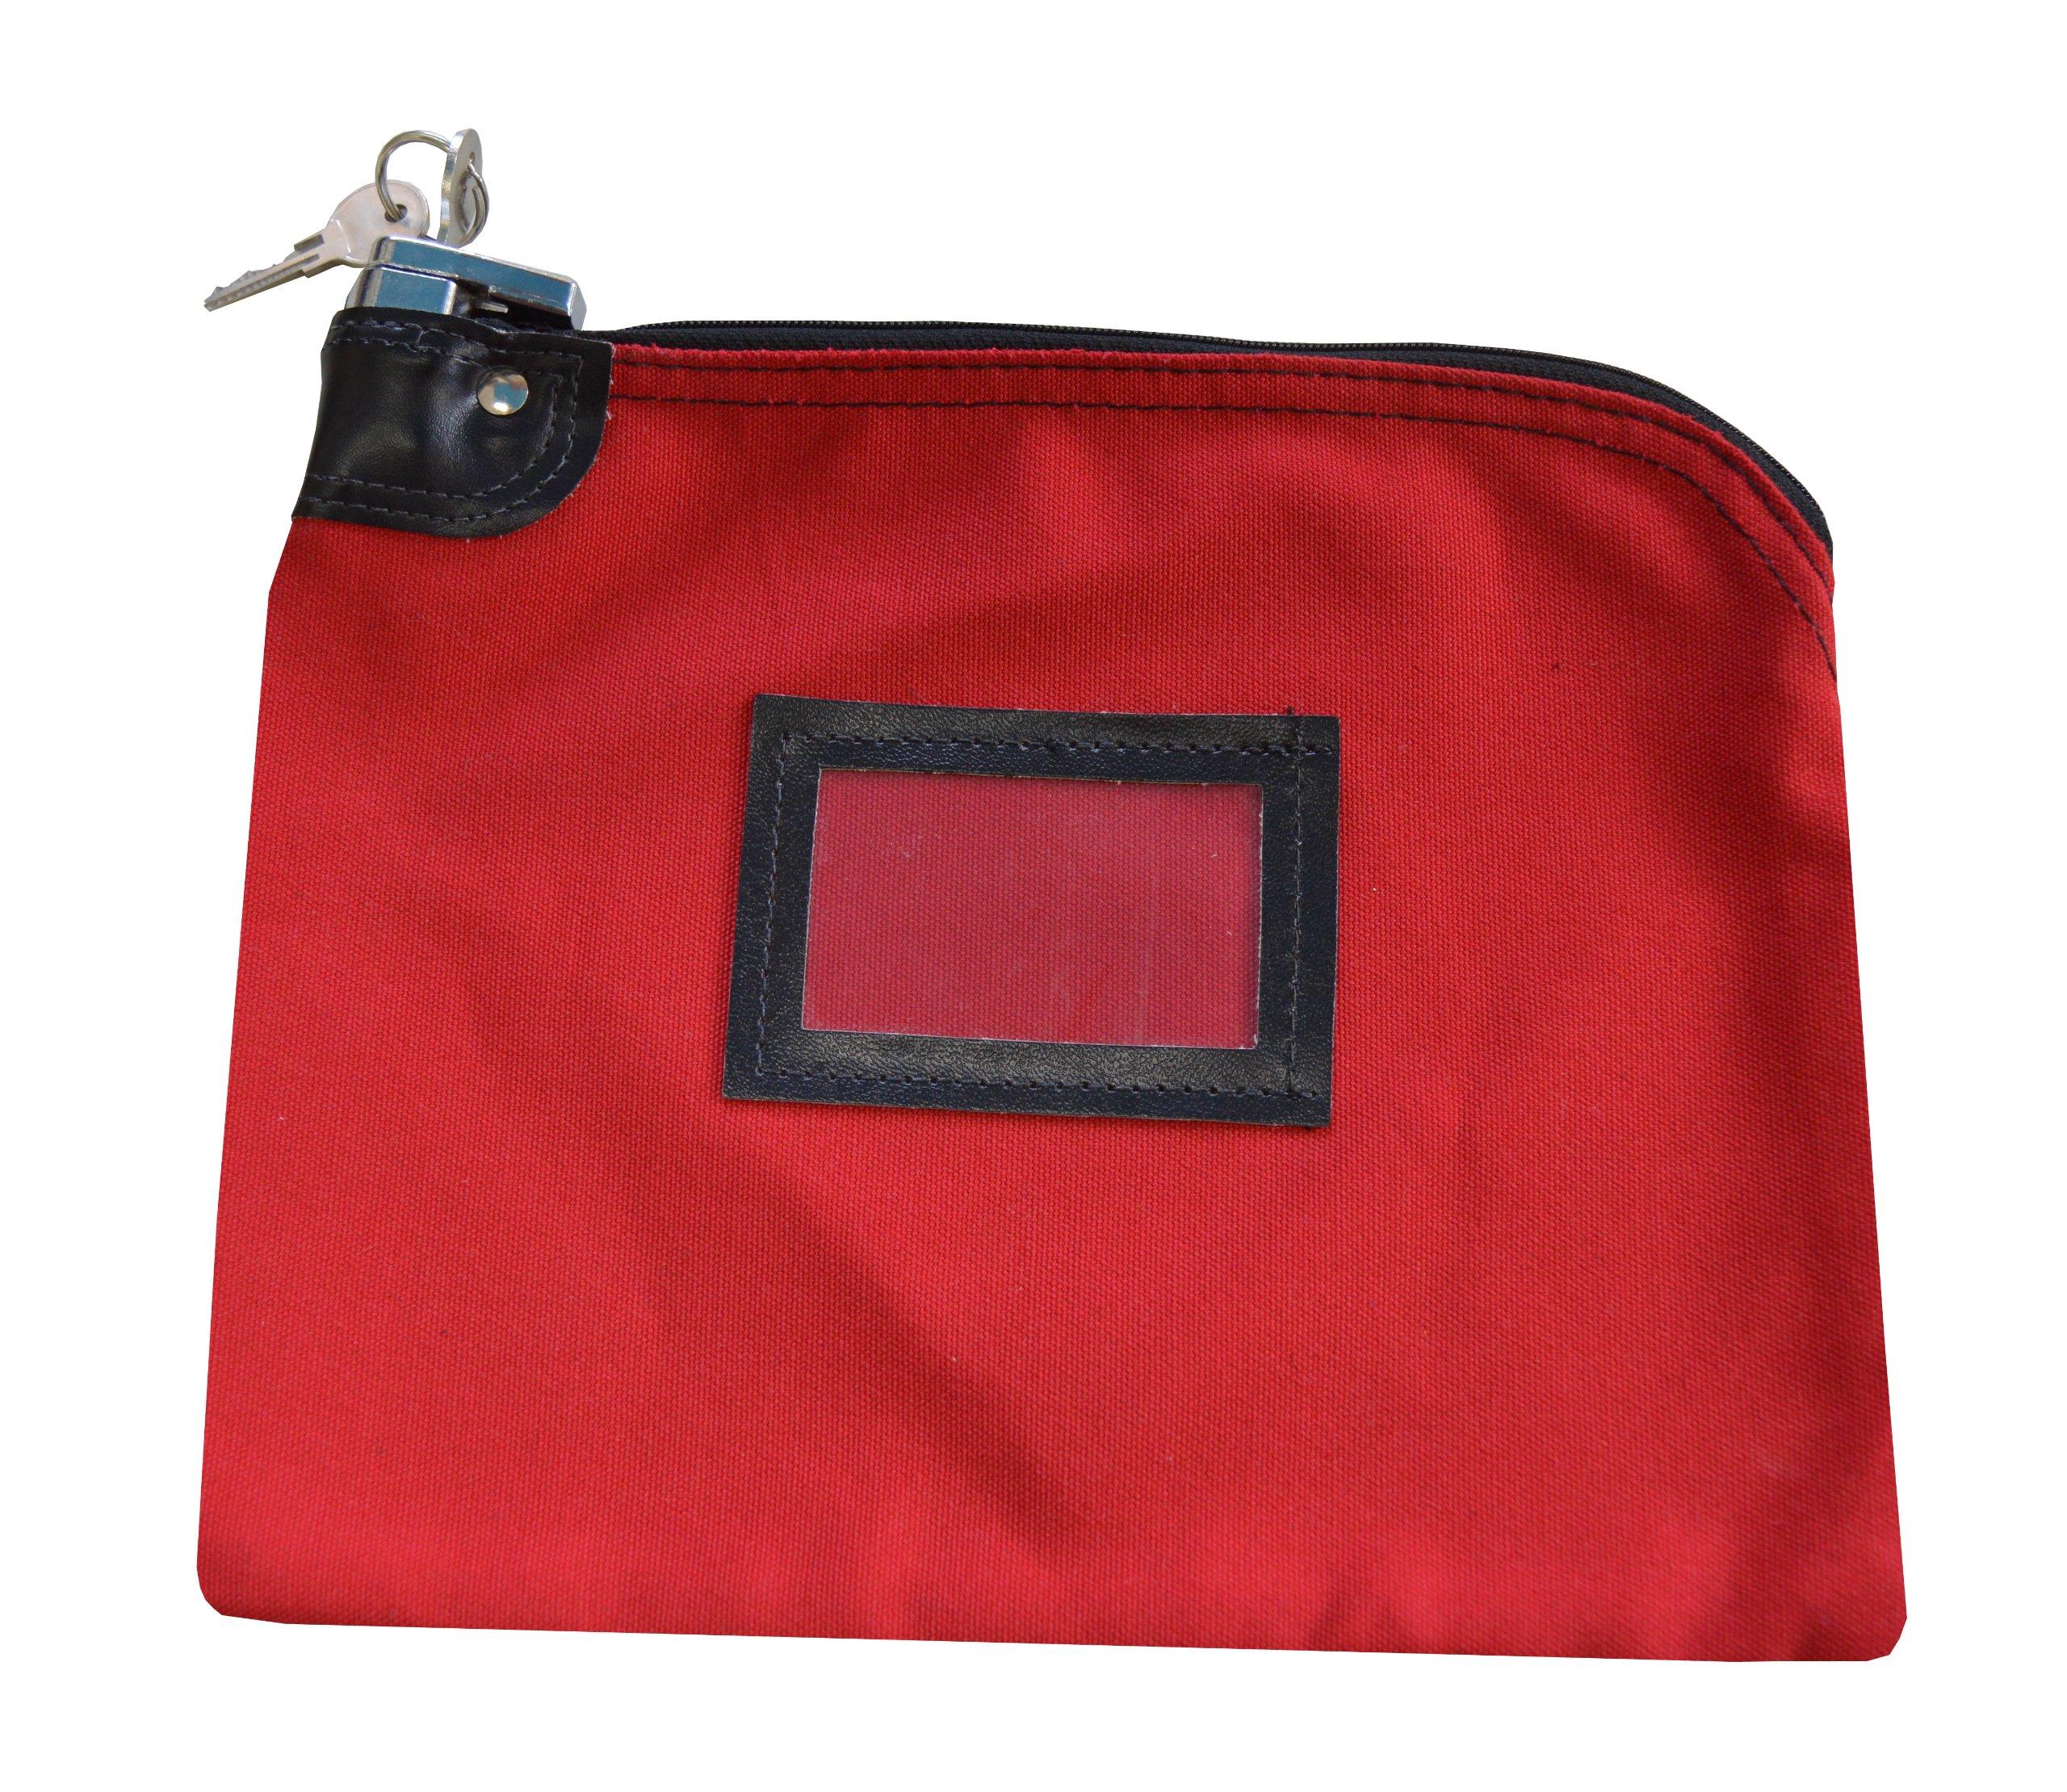 Locking Bank Bag Canvas Keyed Security Red